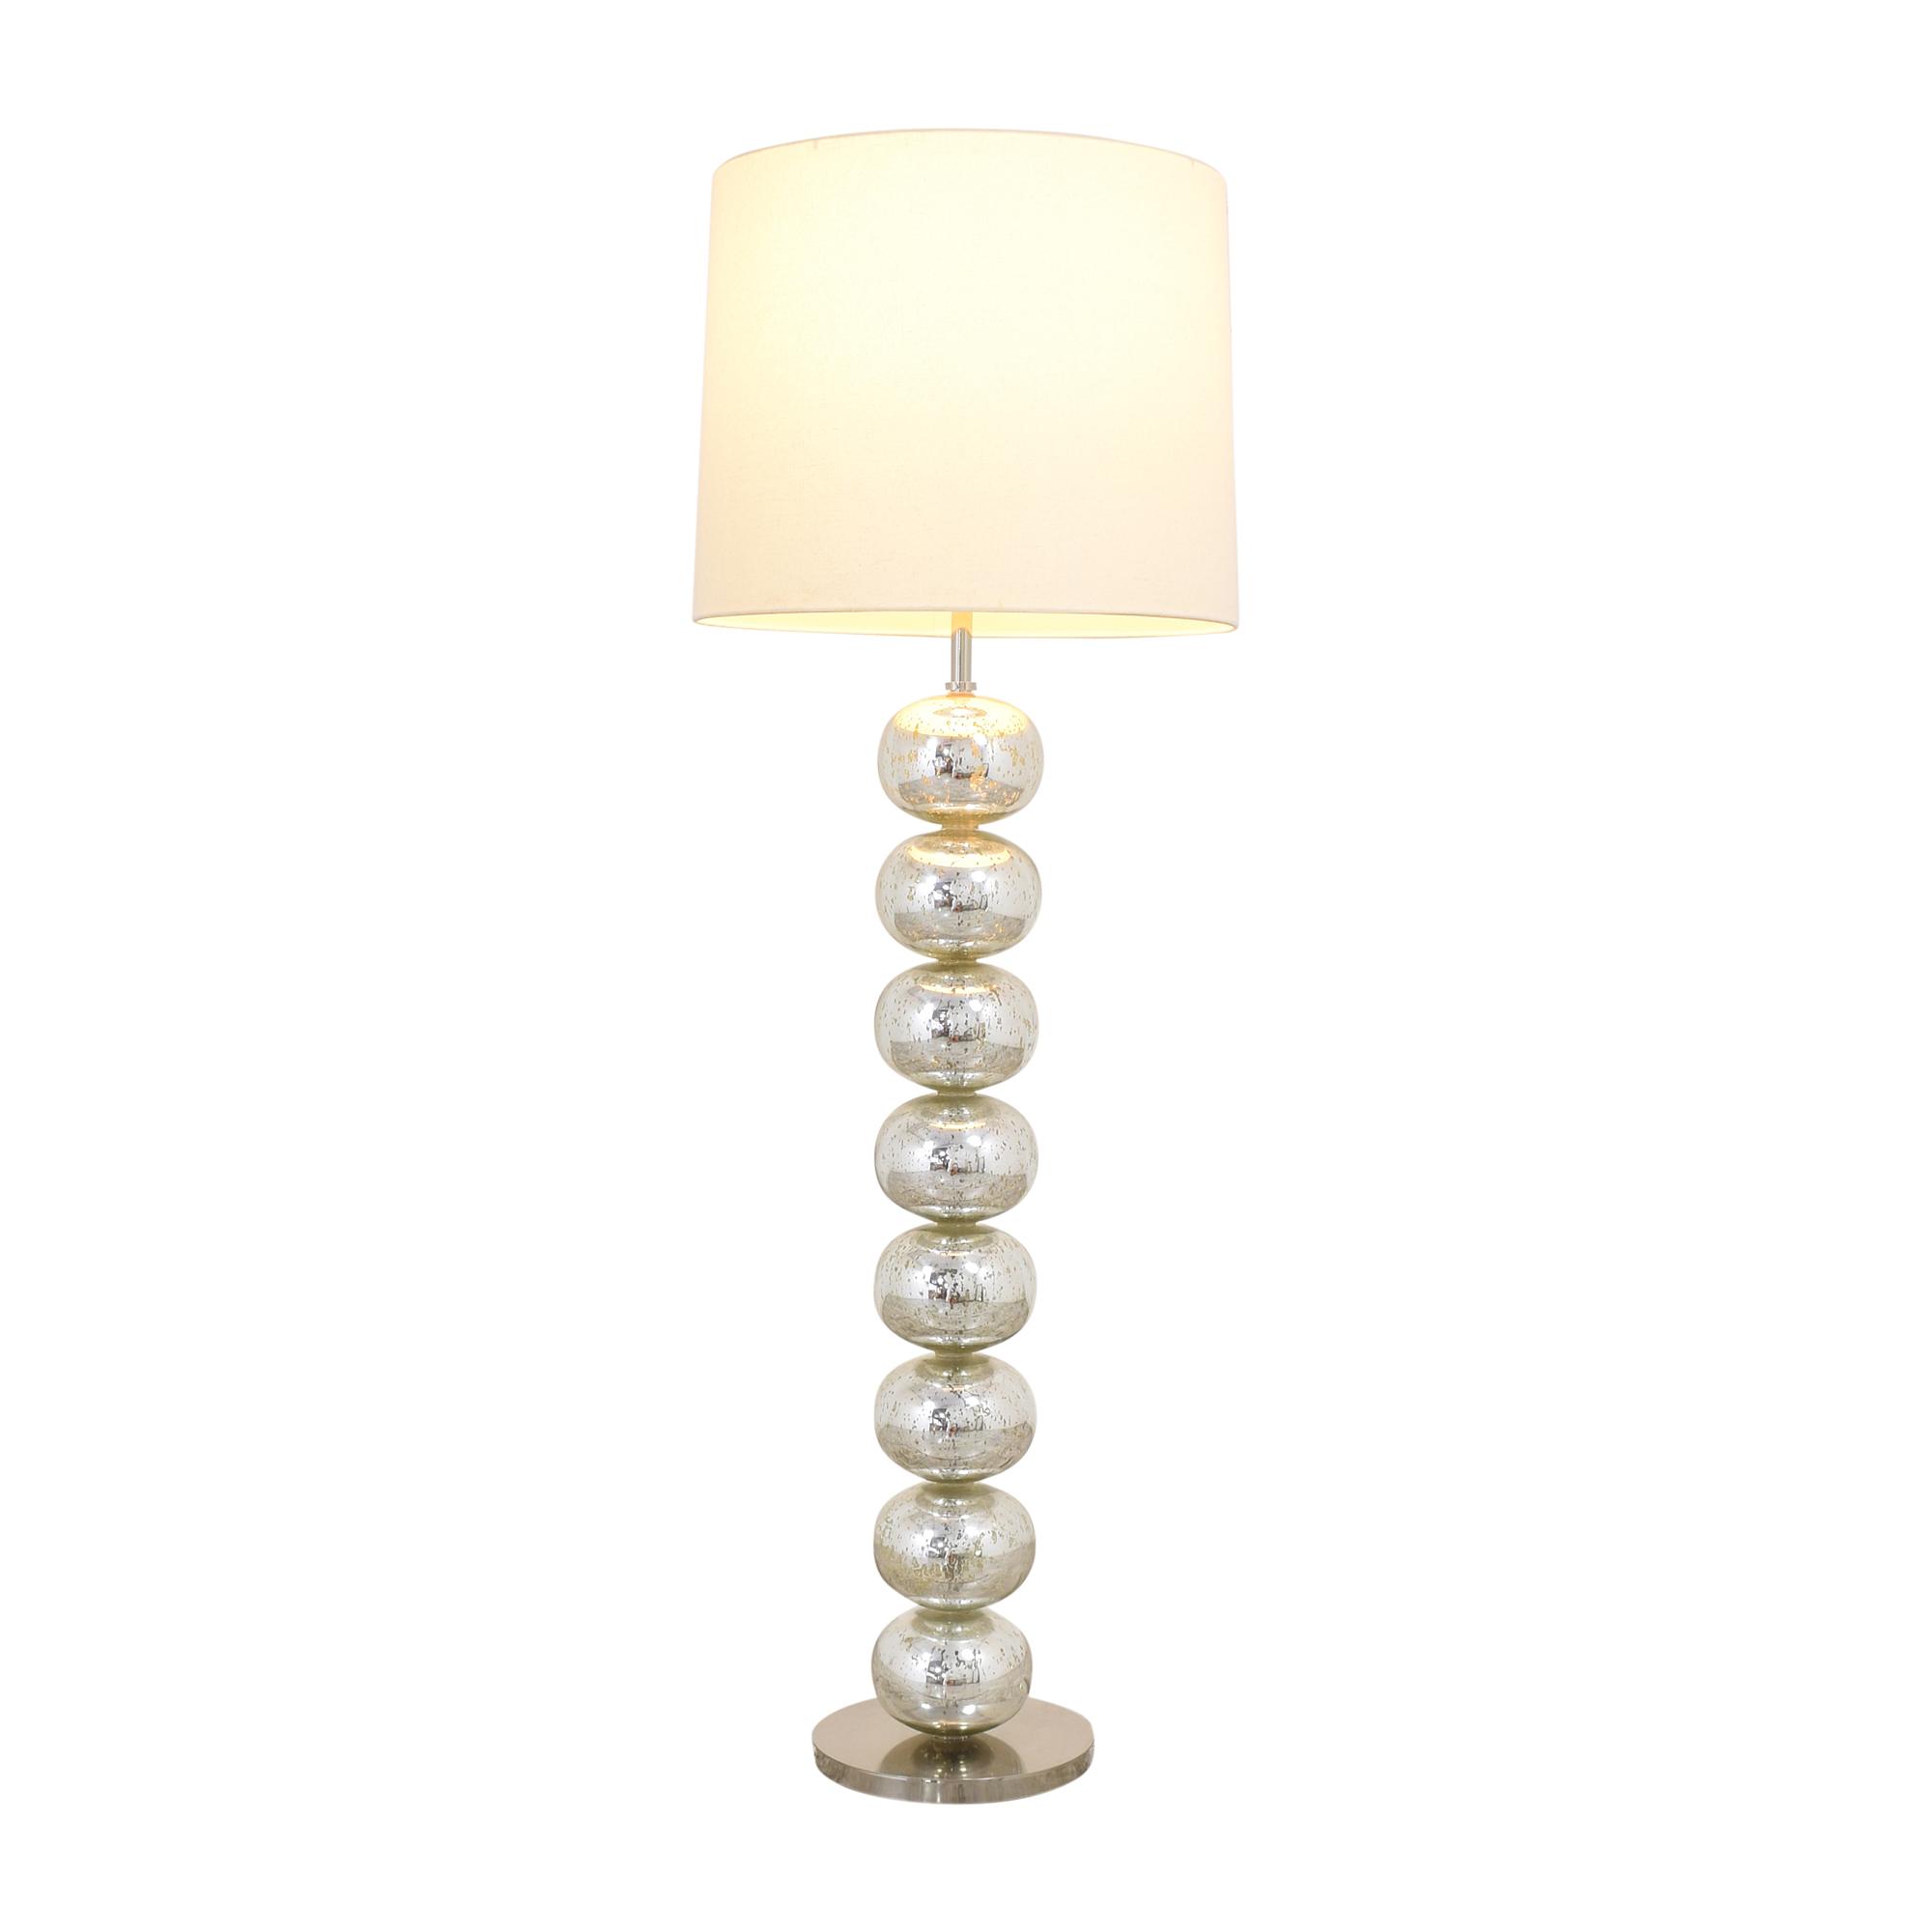 buy West Elm Abacus Floor Lamp West Elm Decor